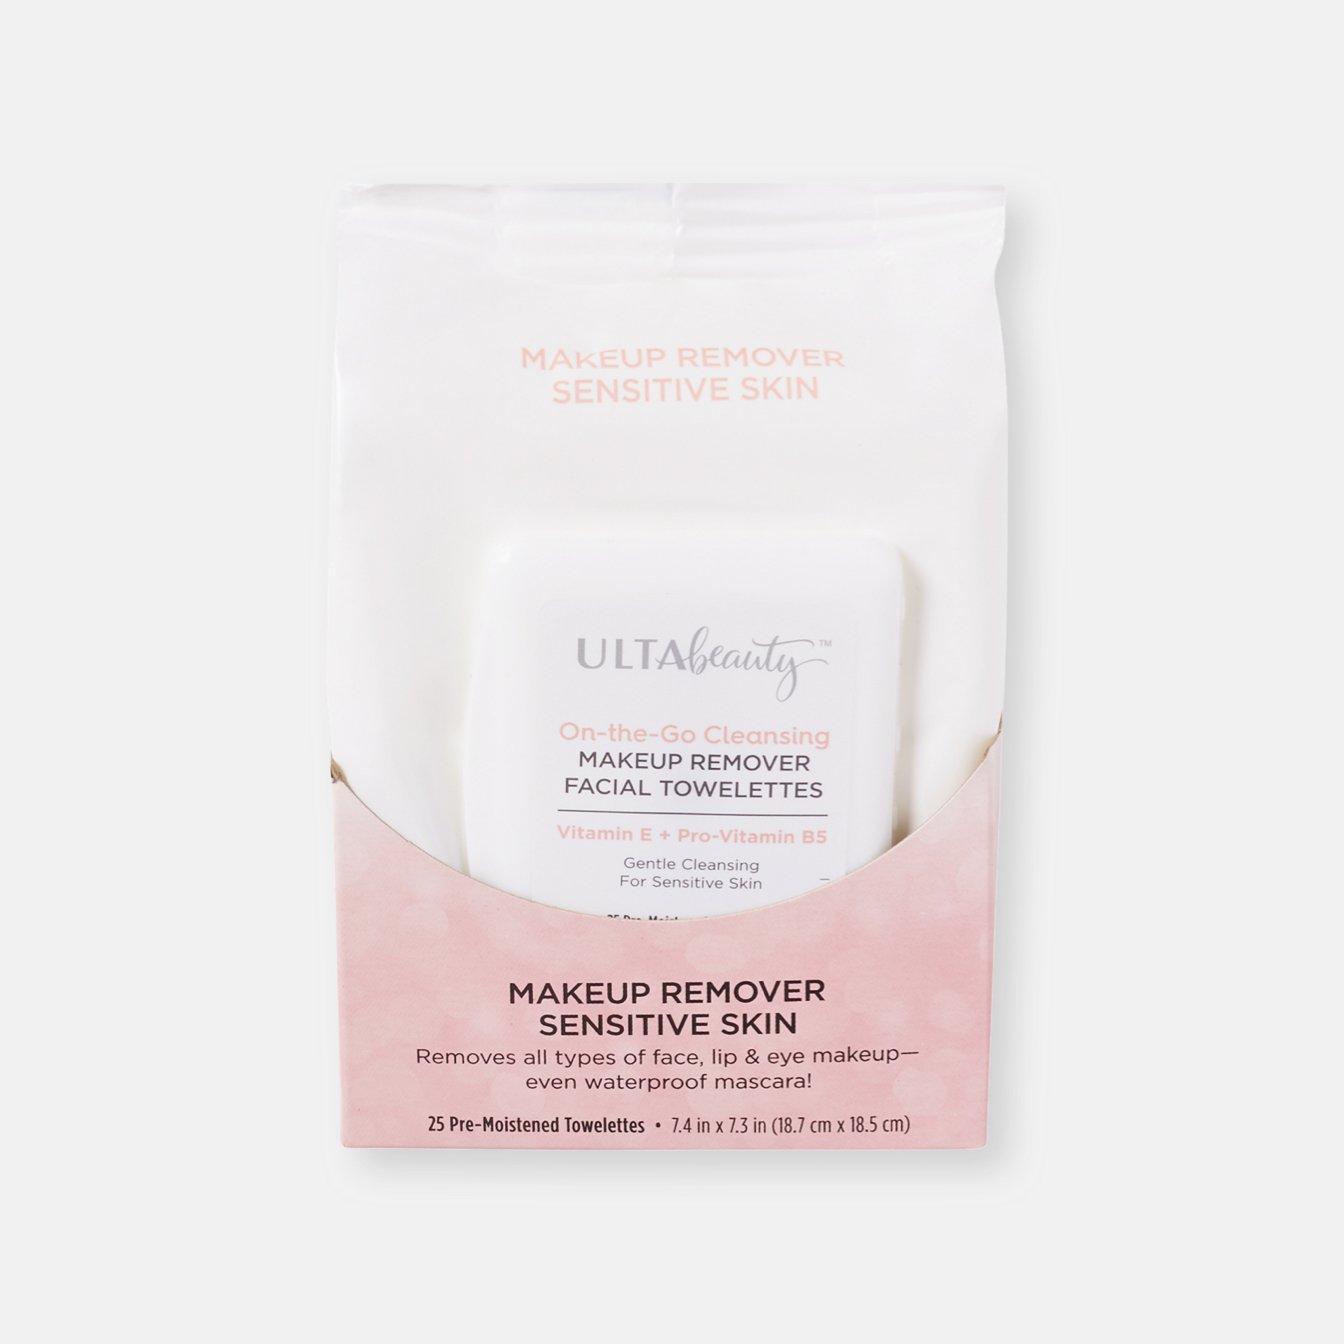 Ulta Sensitive Skin Facial Cleansing Towelettes